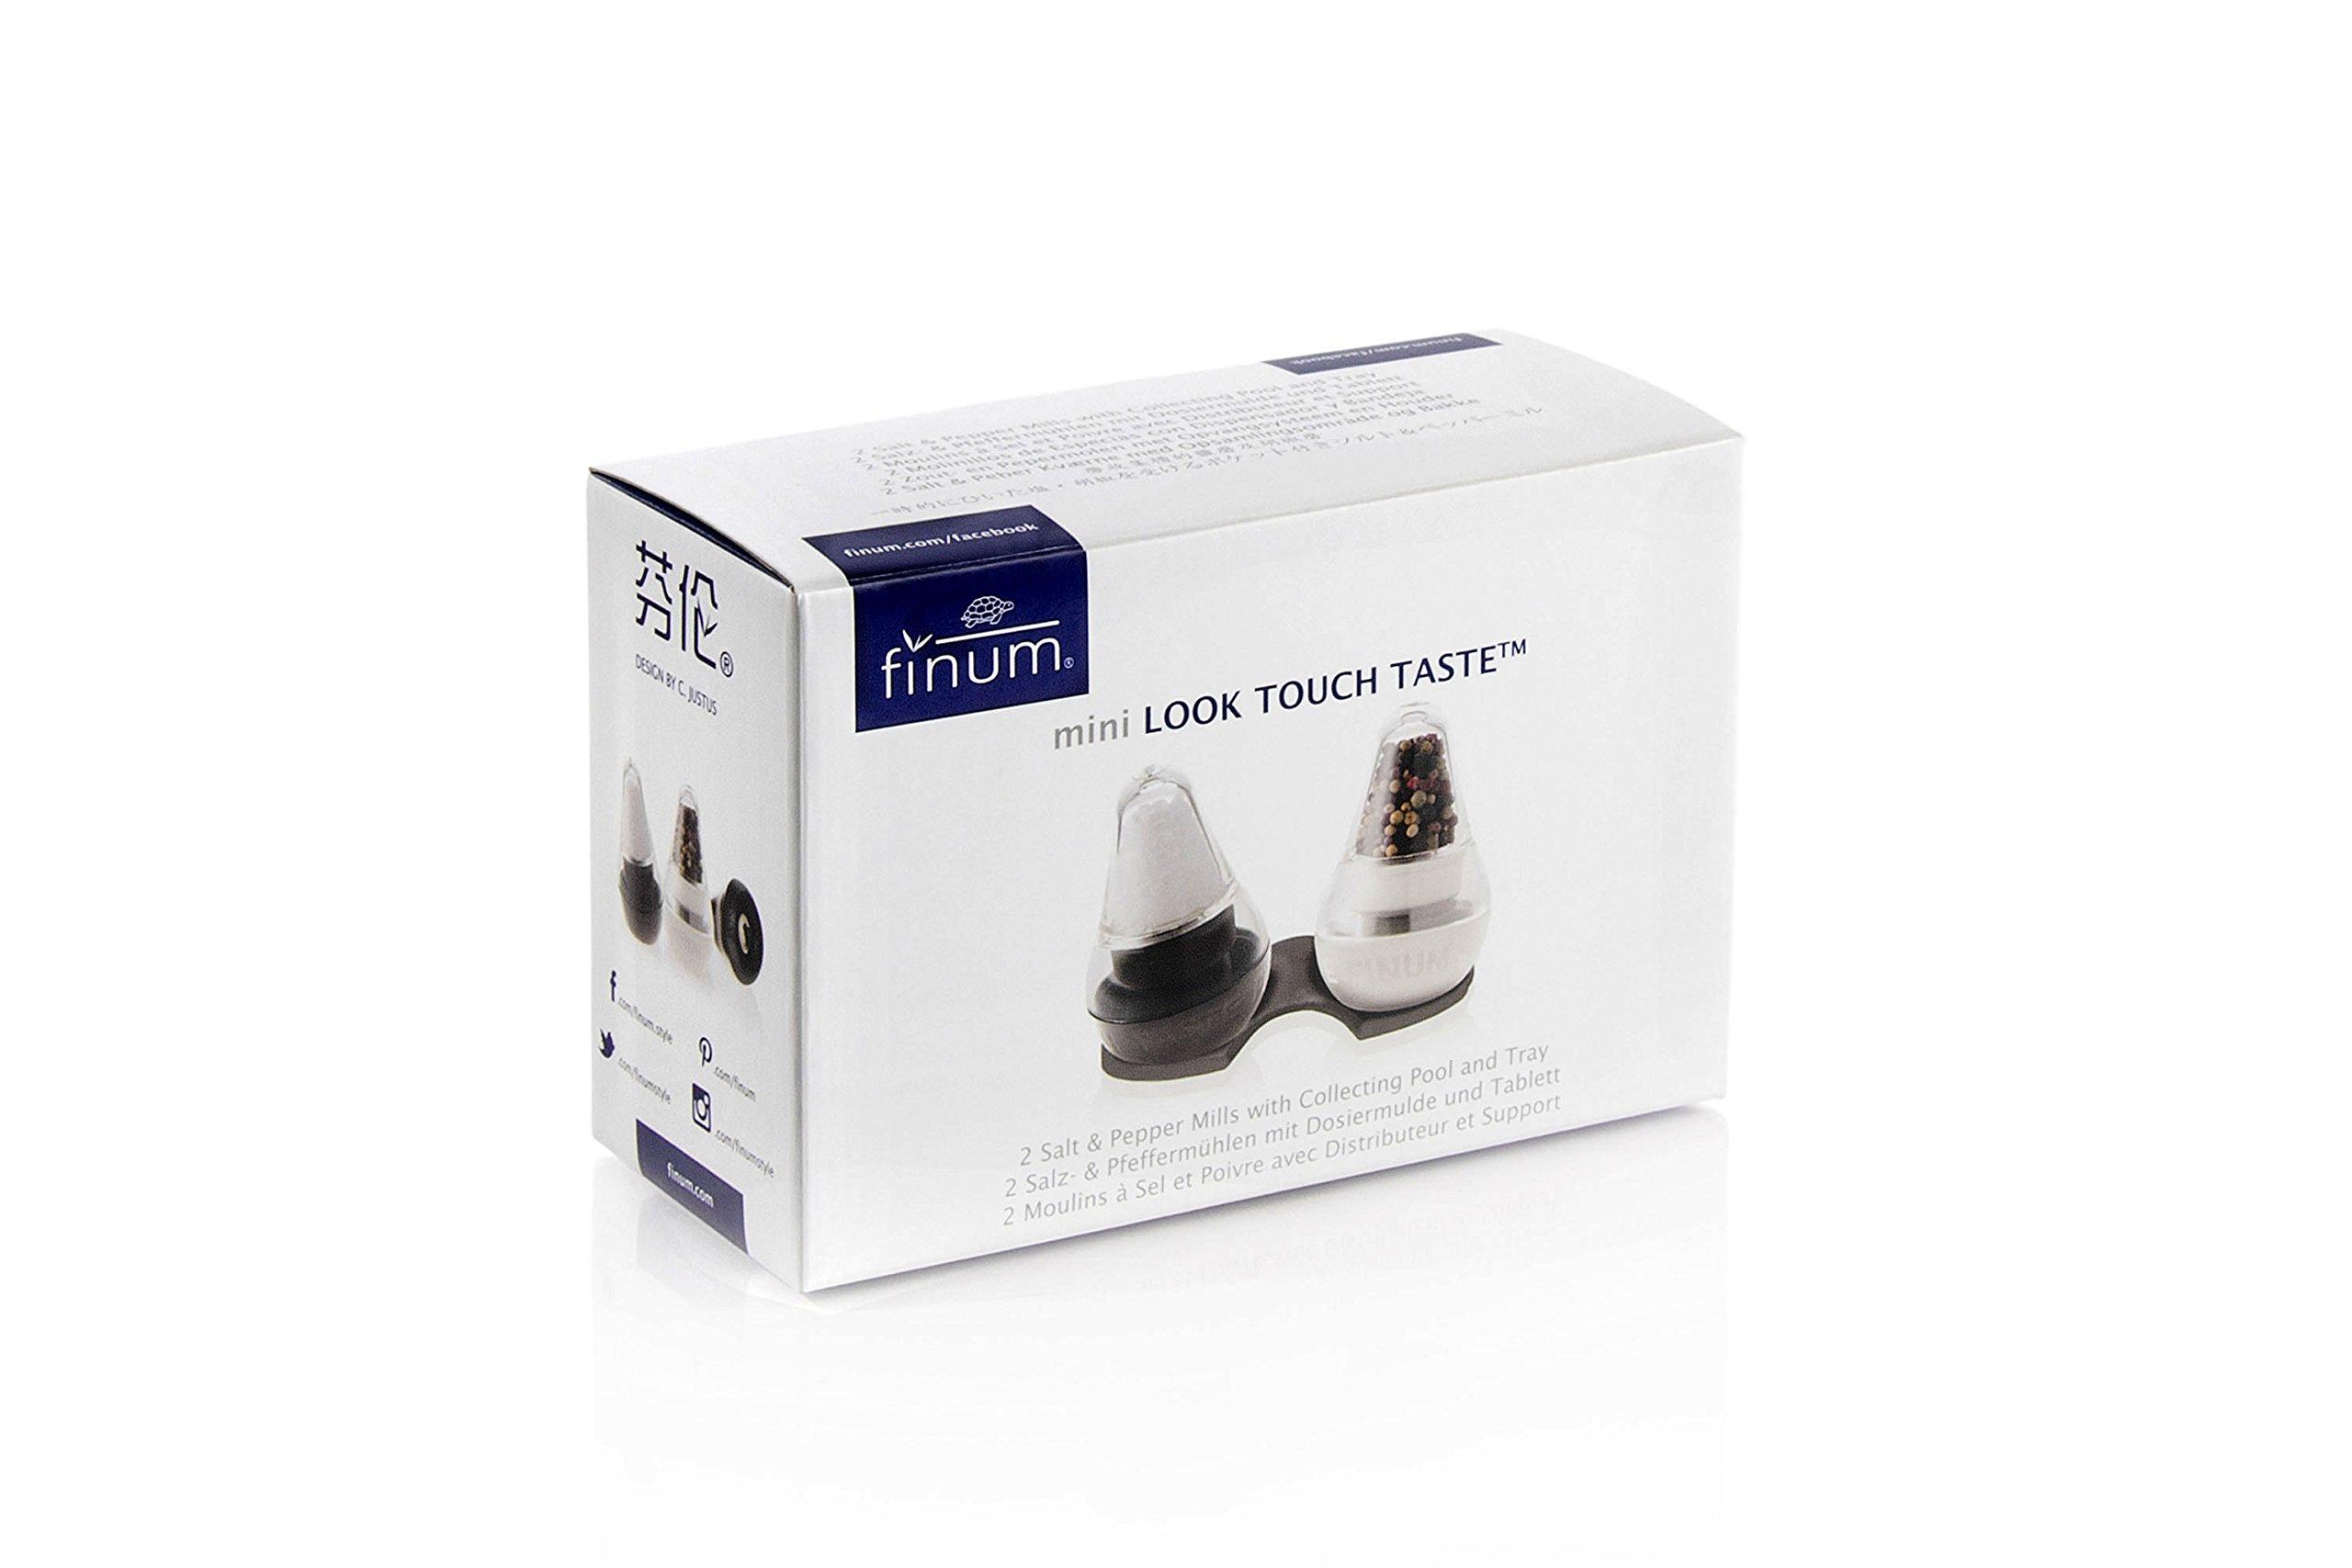 mini Look Touch Taste, Salt & Pepper Grinders (6 retail sets per case) by Finum (Image #2)